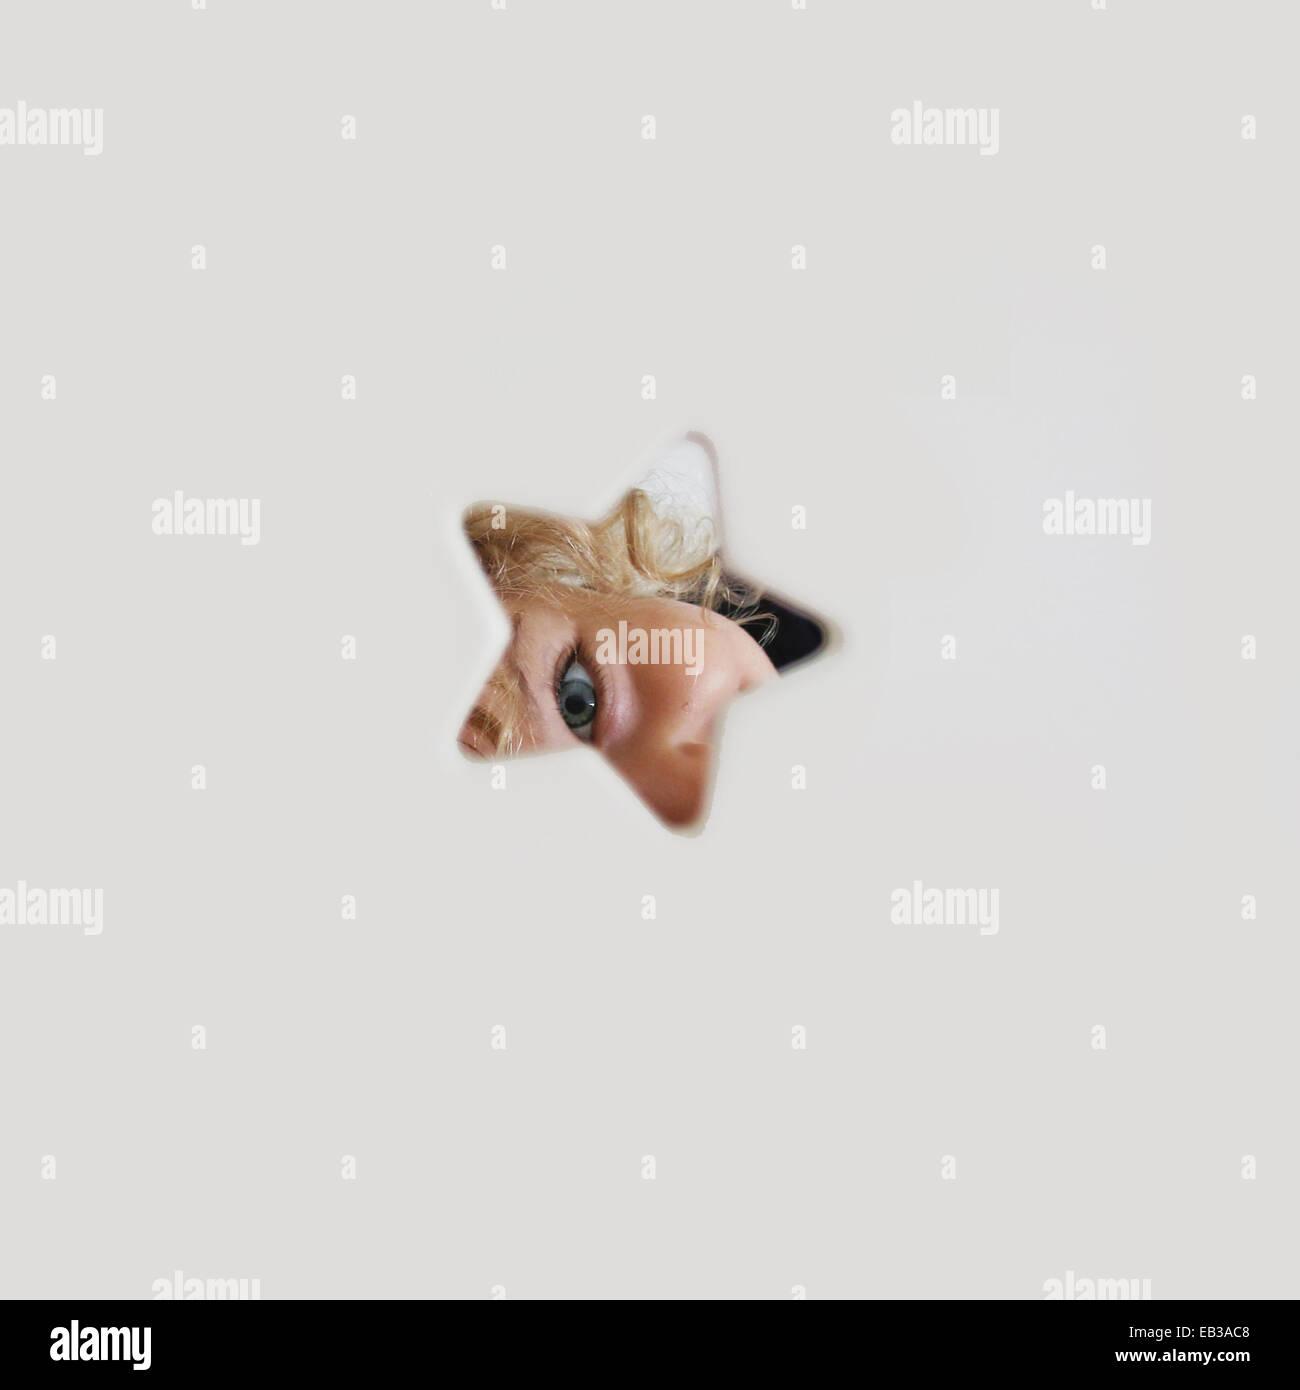 Volksrepublik China, Hong Kong Island, Hongkong, kleines Mädchen (2-3) Blick durch Sterne geformt Loch Stockbild